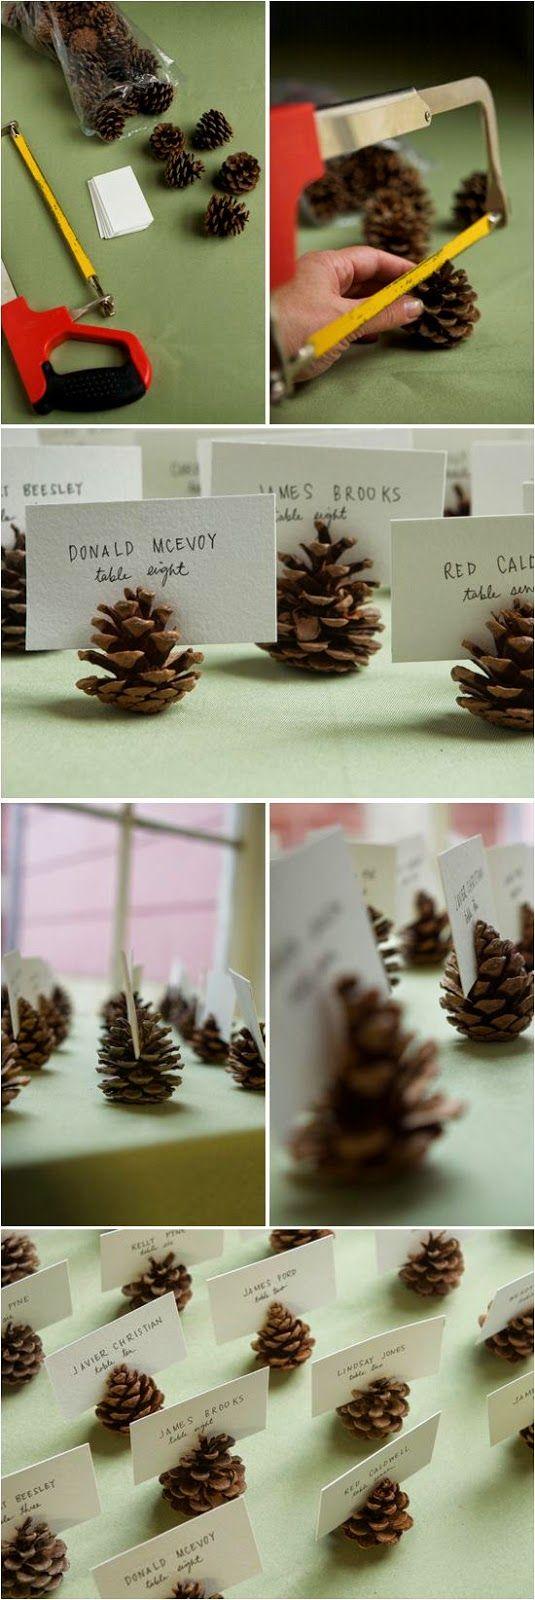 best place settings images on pinterest wedding ideas wedding